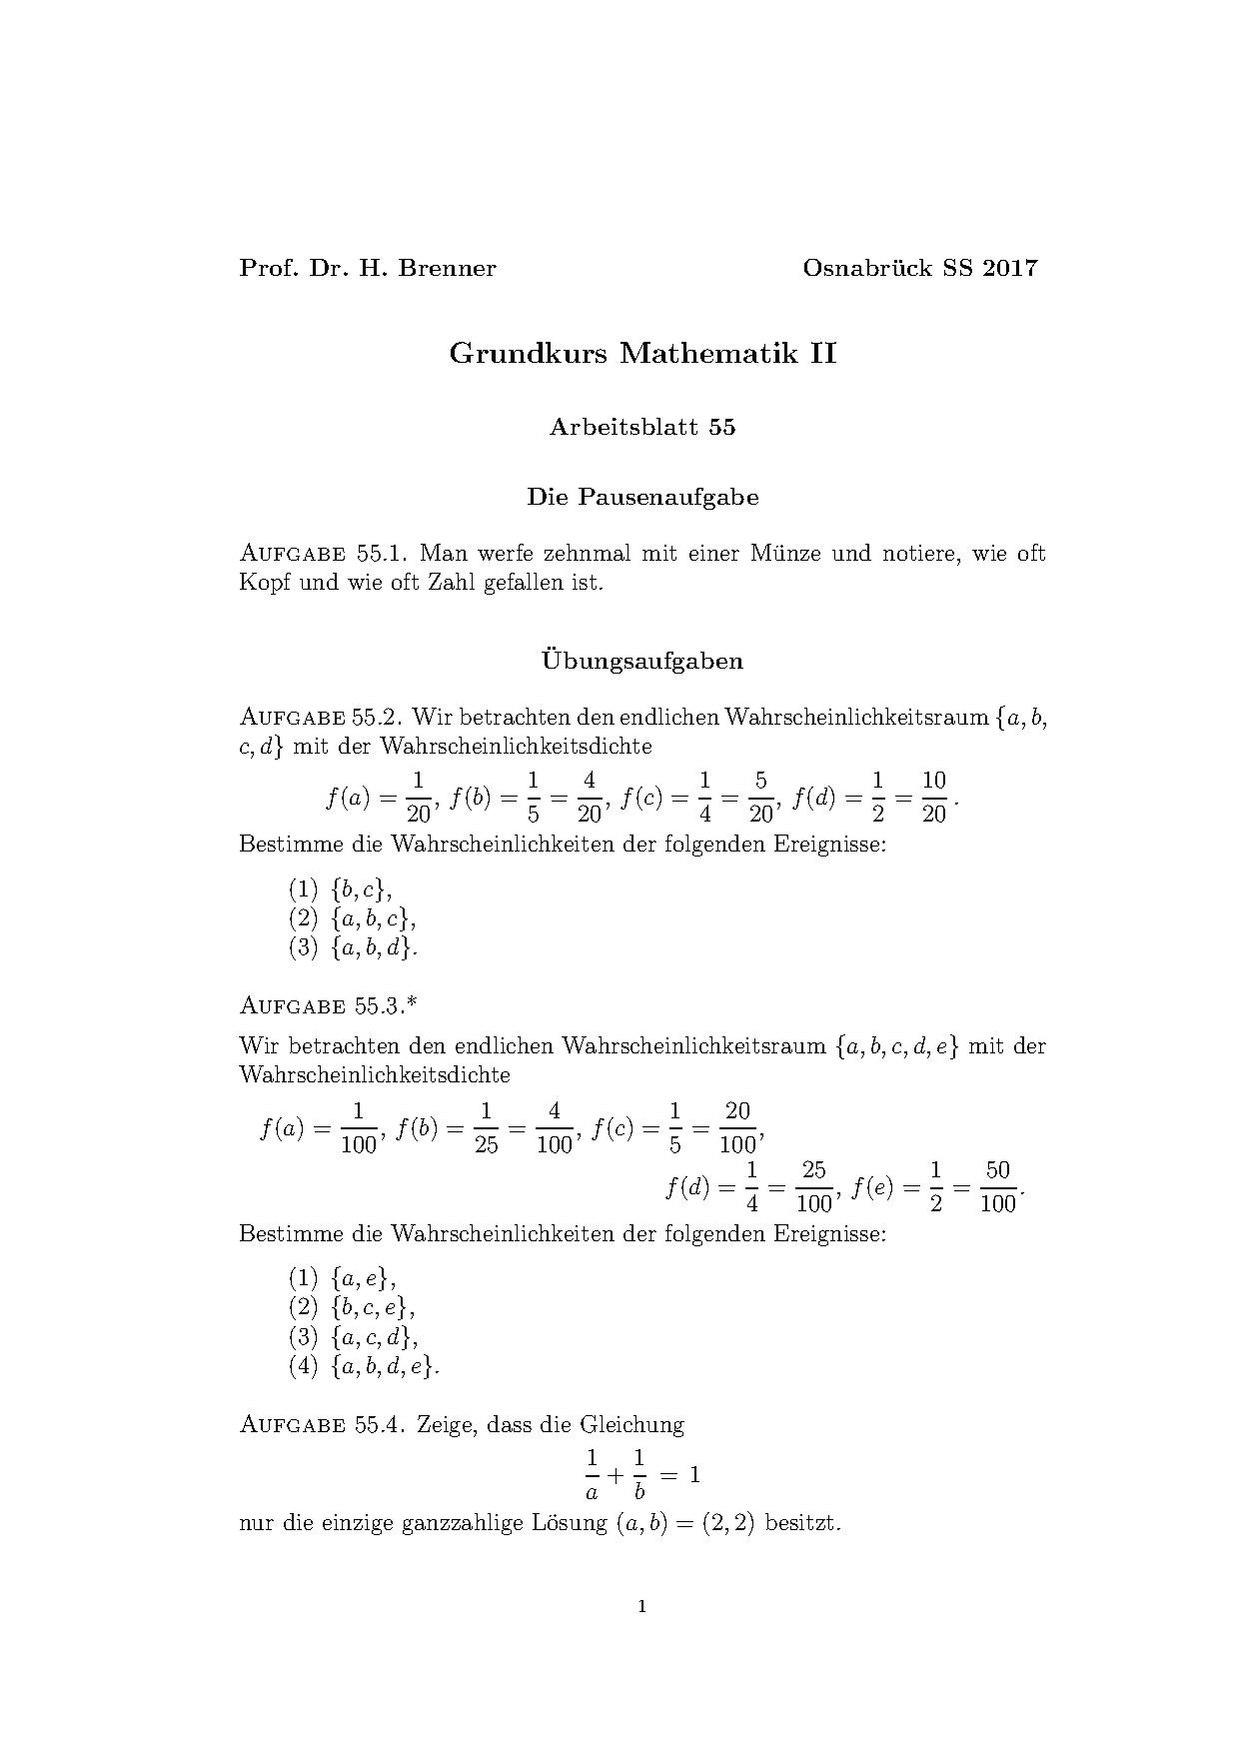 Charmant Grad 4 Mathe Arbeitsblatt Pdf Bilder - Mathe Arbeitsblatt ...